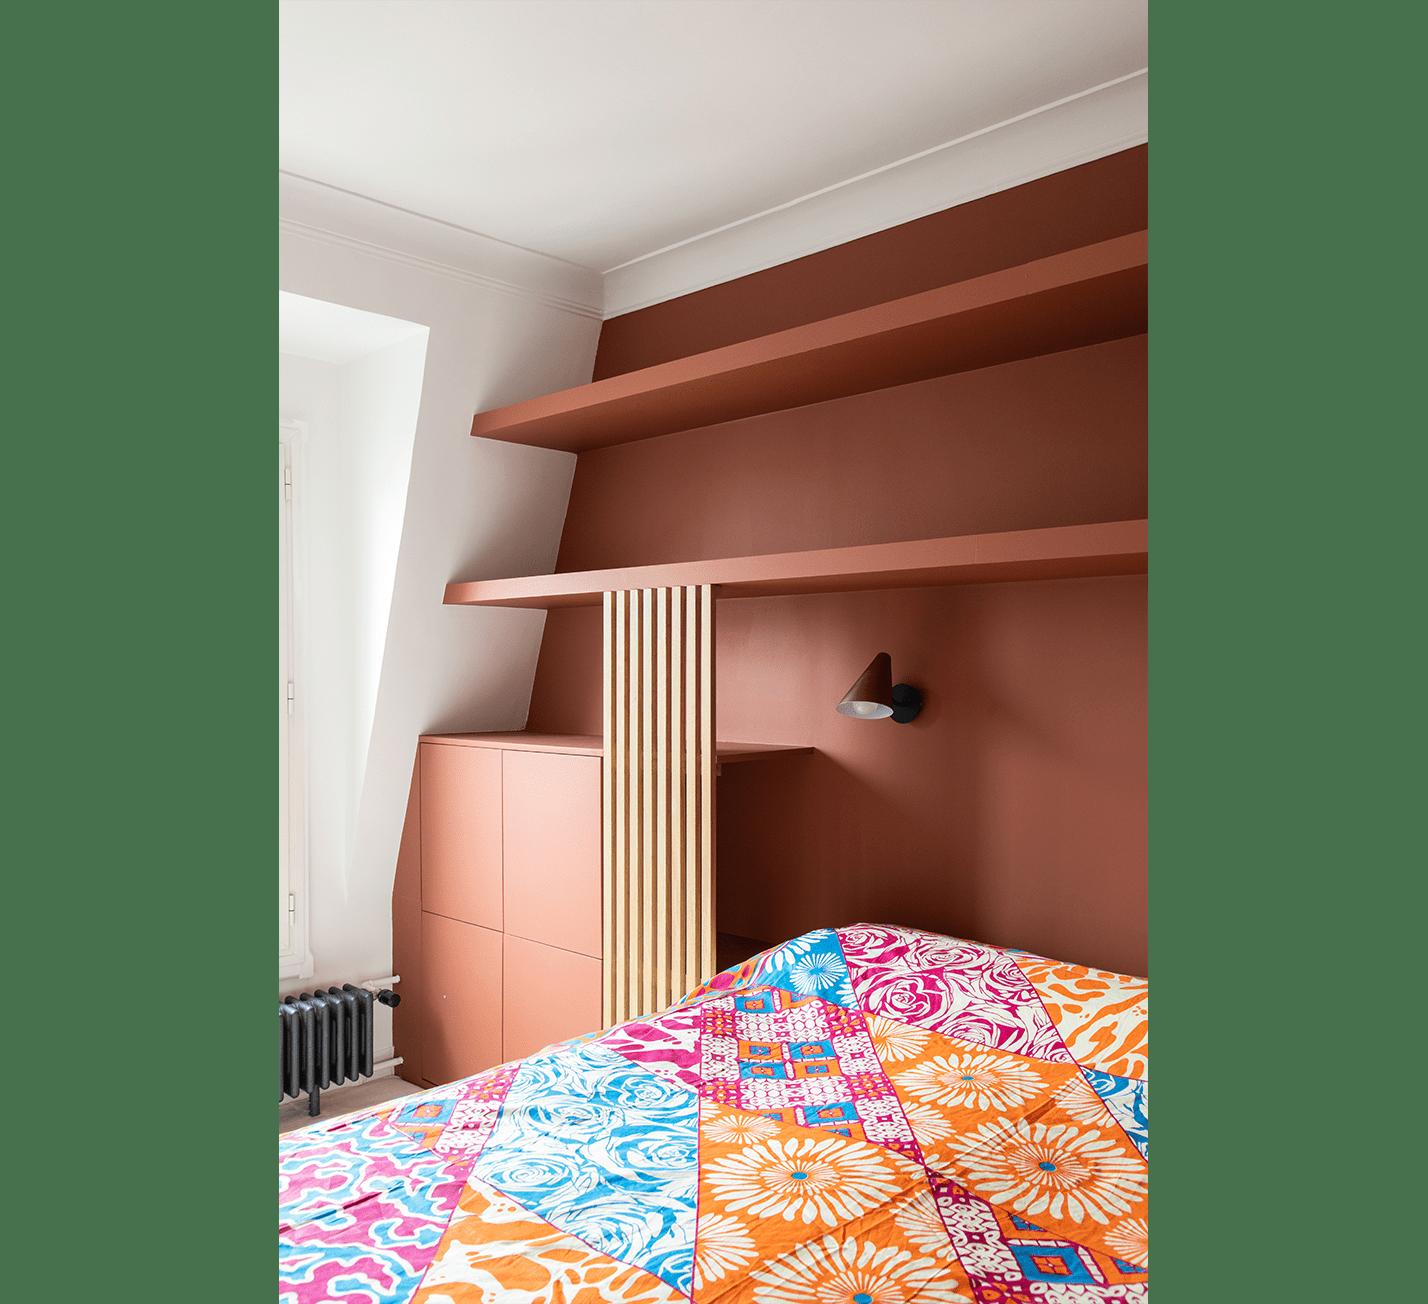 Projet-Senoch-Atelier-Steve-Pauline-Borgia-Architecte-interieur-09-min